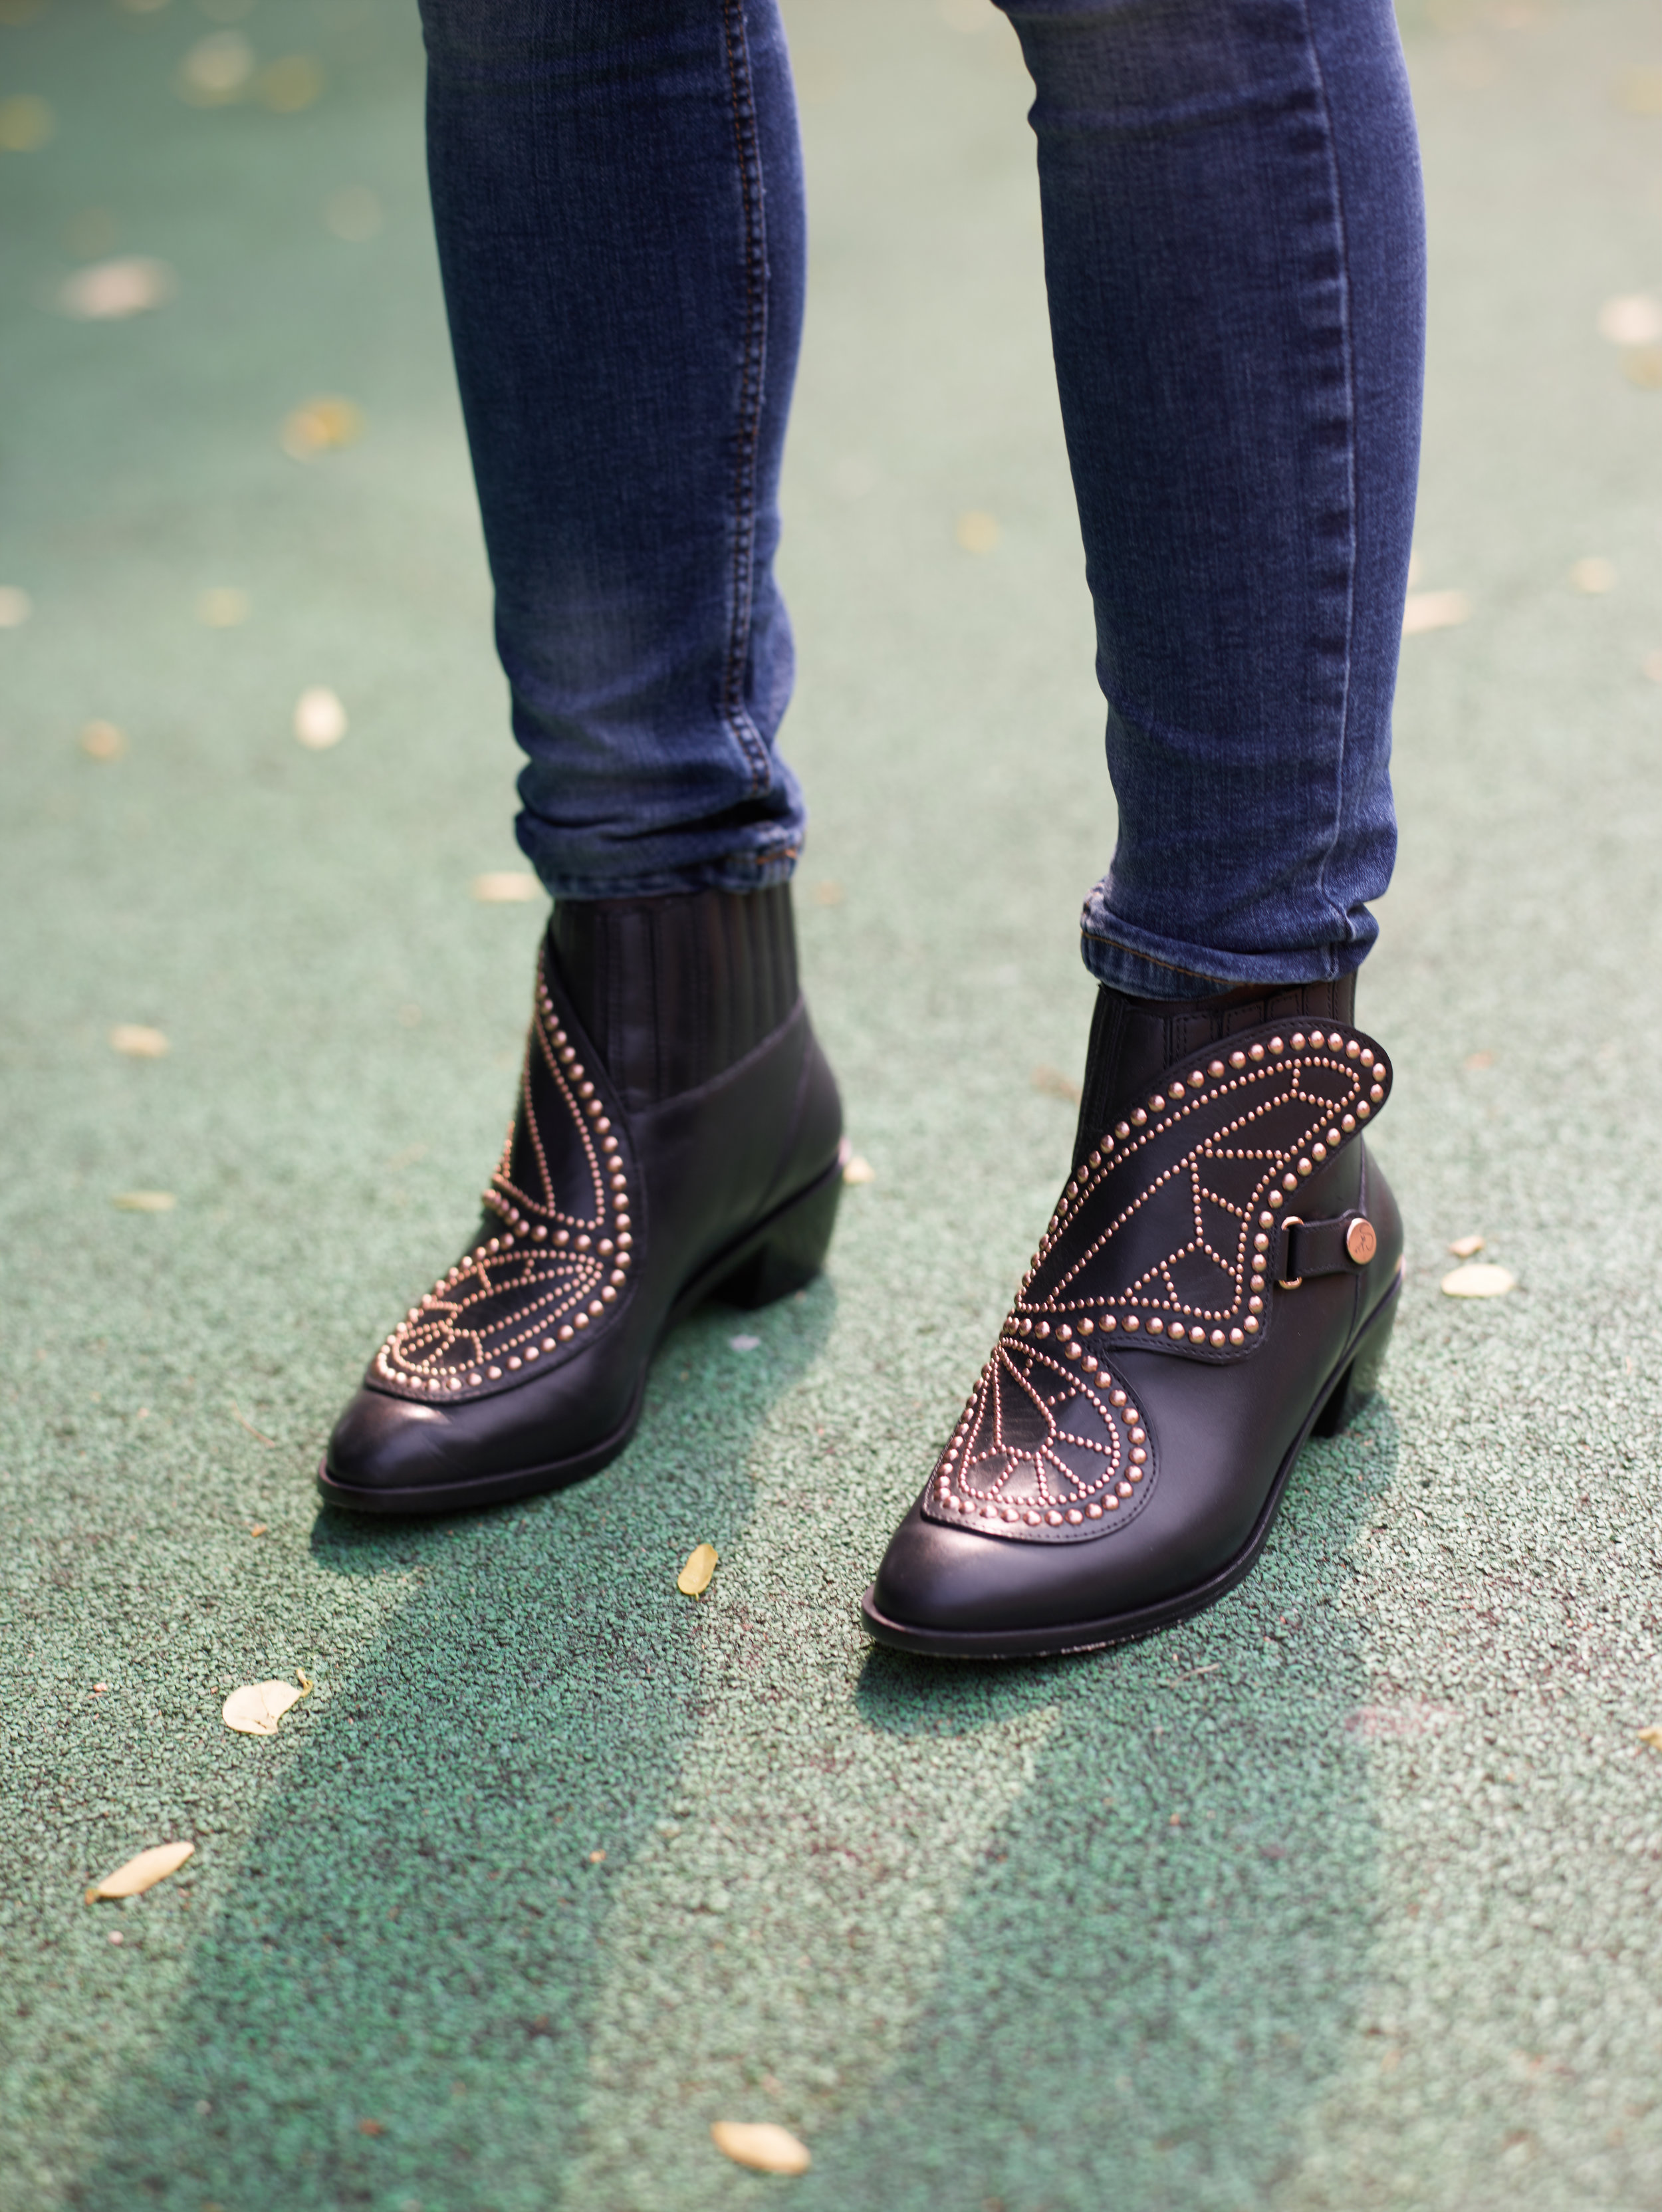 Sophia Webster Karina Butterfly Boots